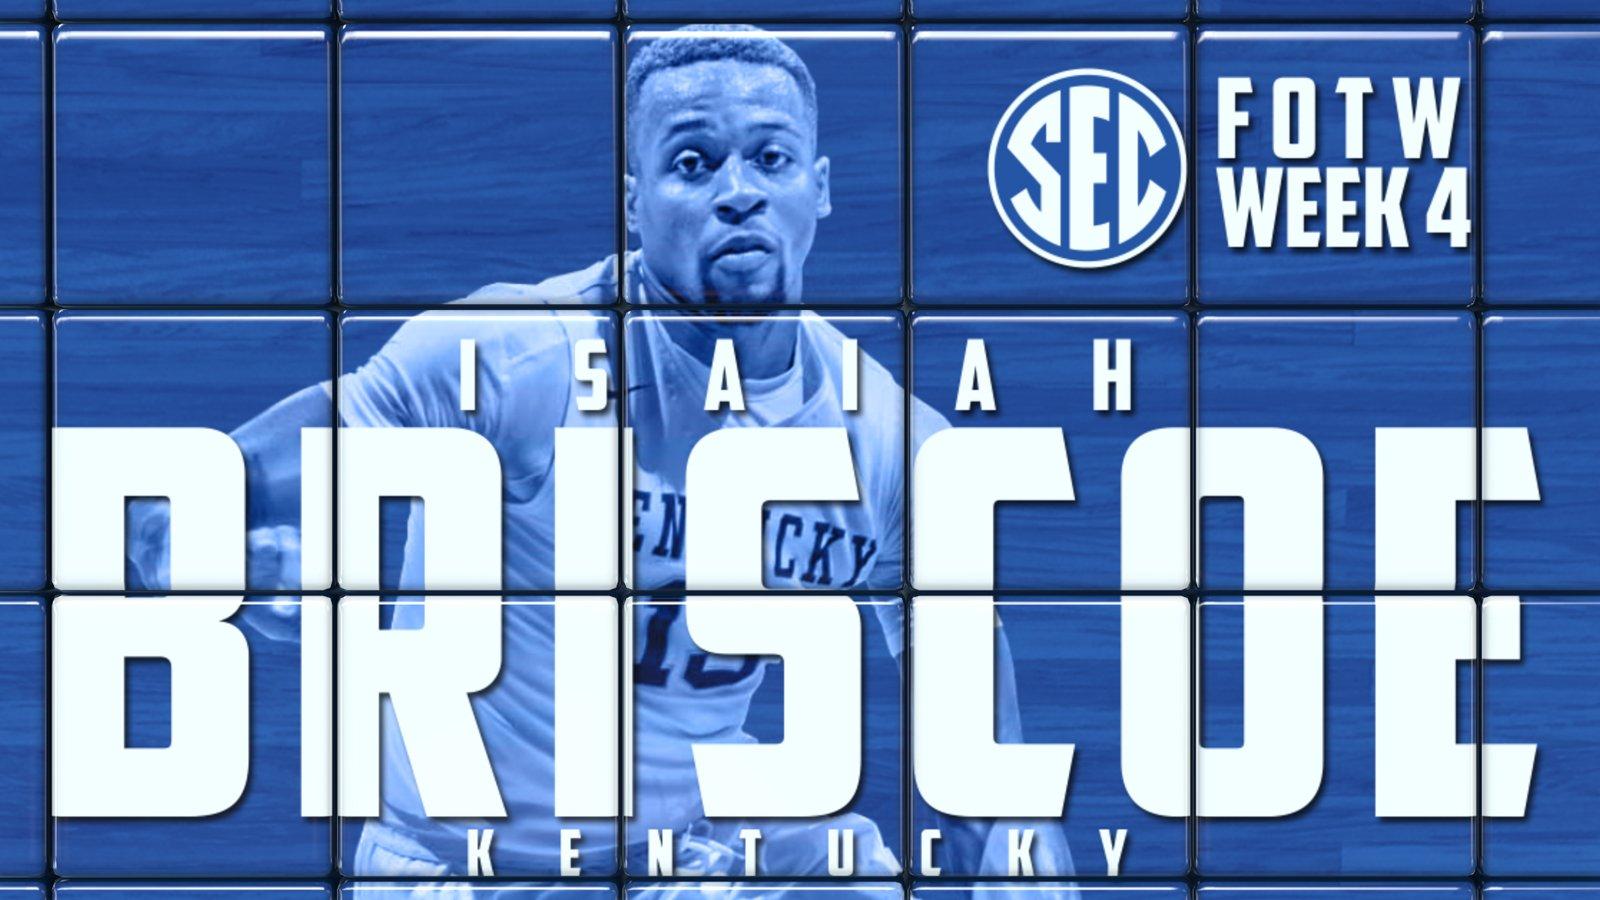 Kentucky Basketball Fox Named Sec Freshman Of The Week: Isaiah Briscoe Named SEC Freshman Of The Week